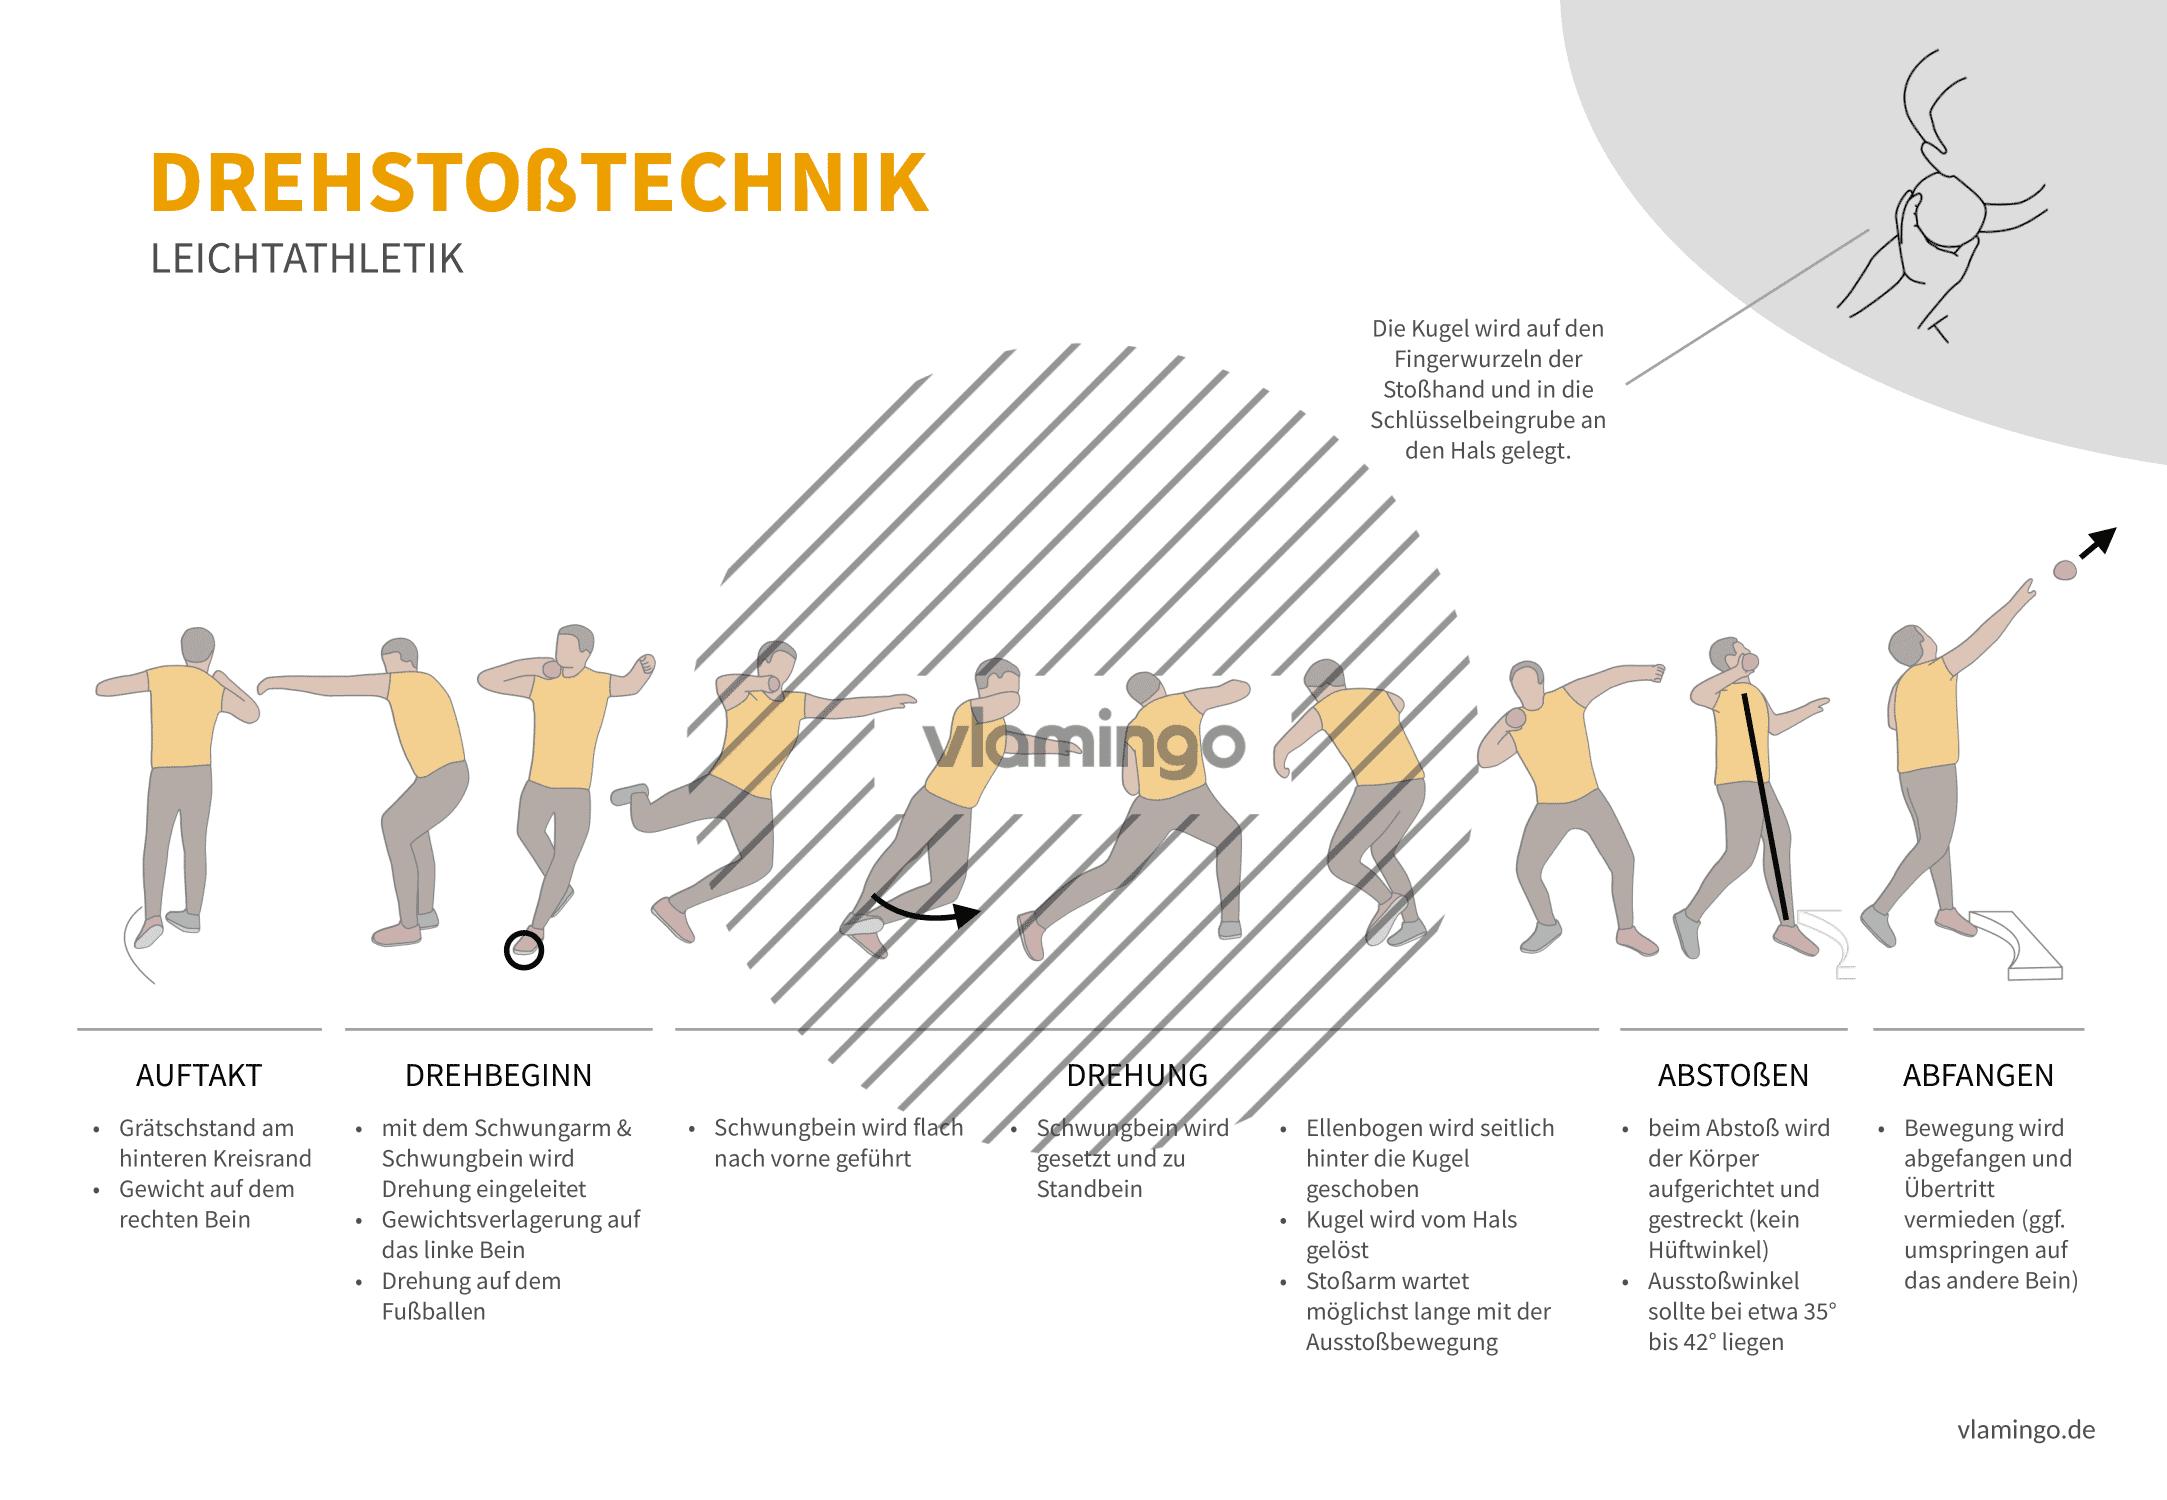 Drehstoßtechnik (Bewegungsanalyse) - Leichtathletik